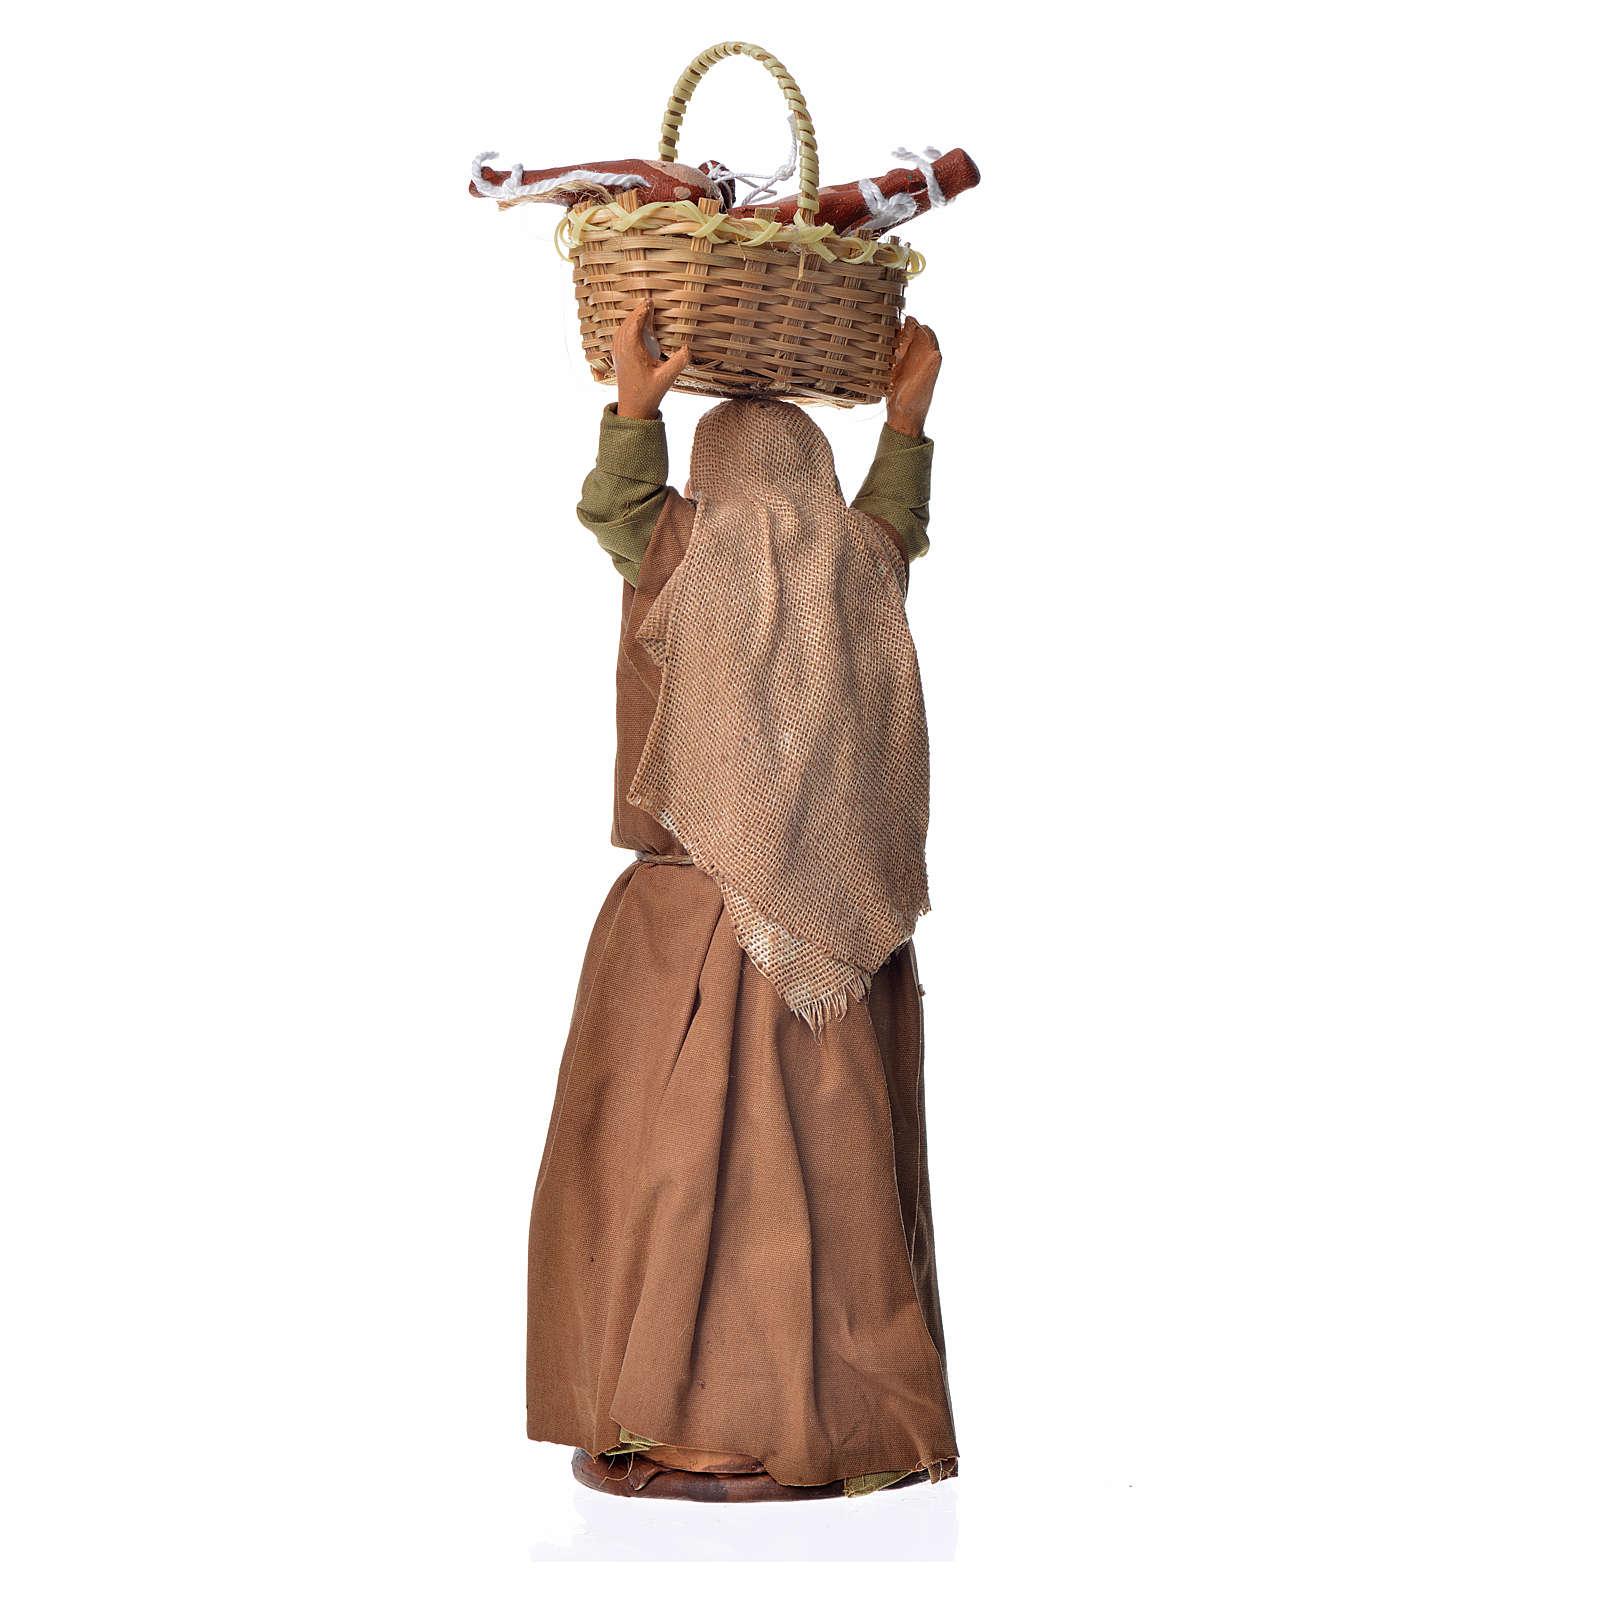 Nativity set accessory woman with bread 14 cm figurine 4